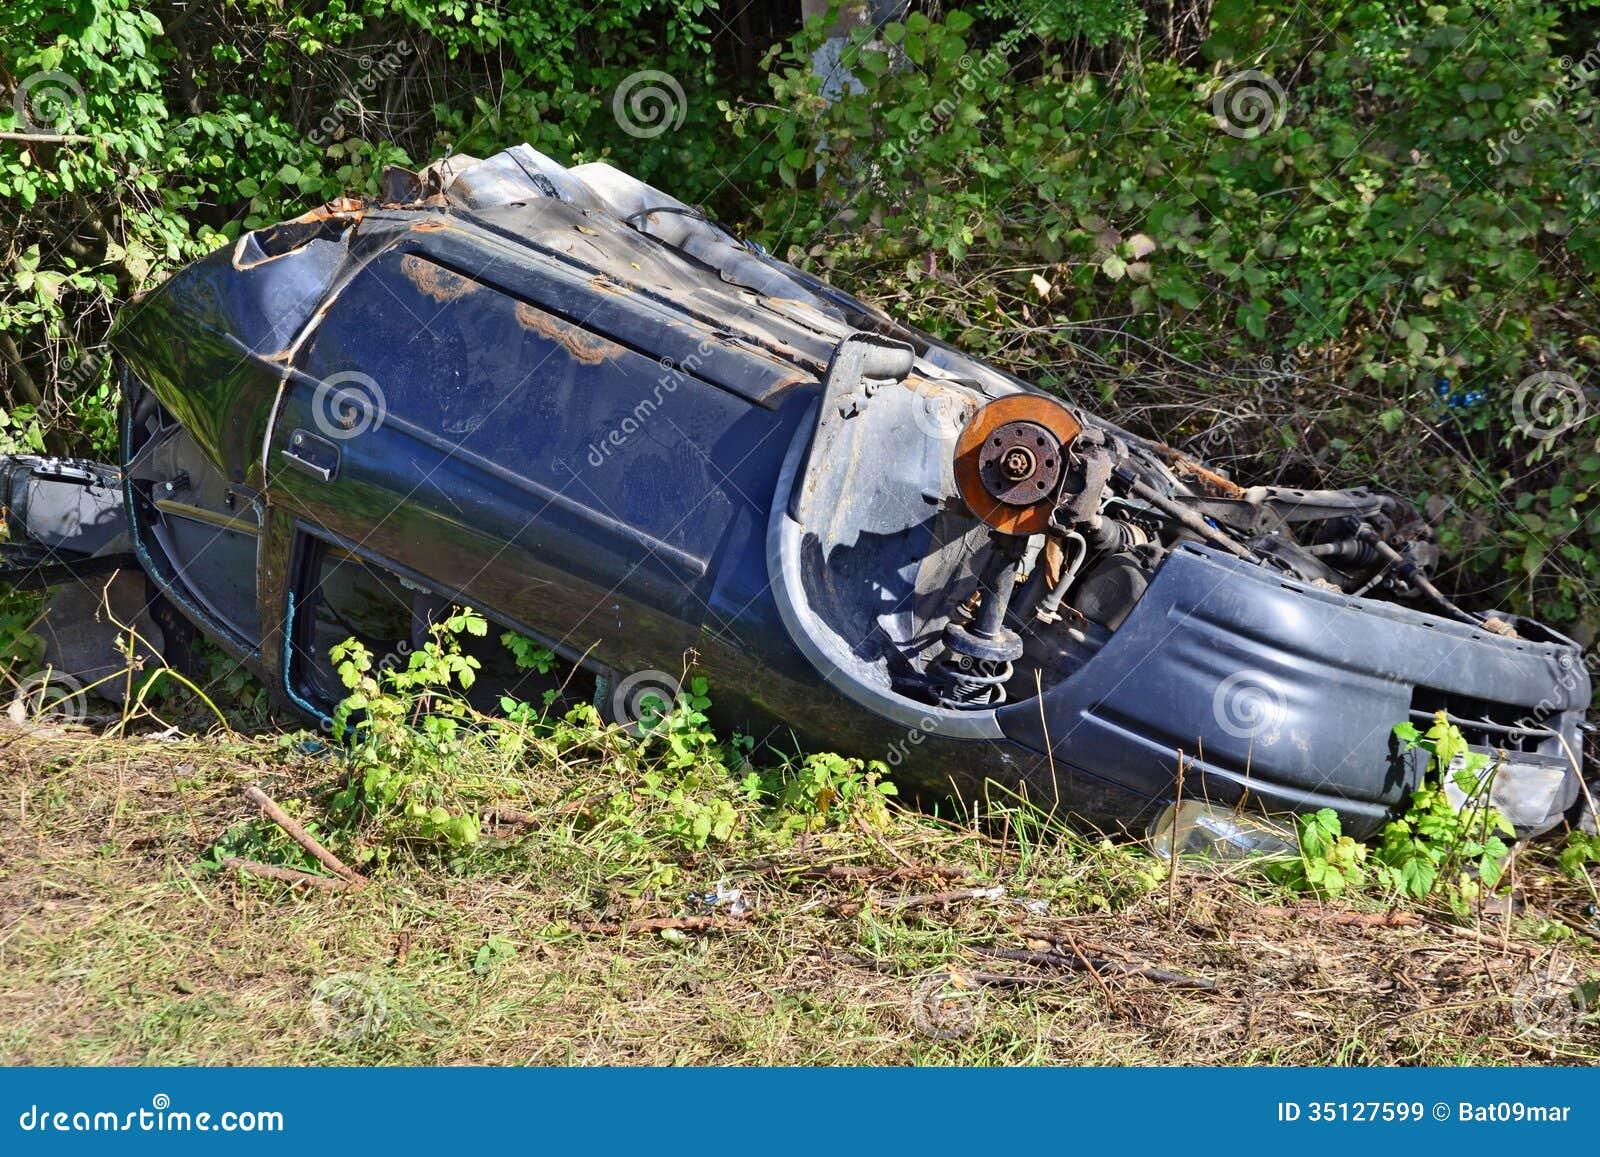 Car Wreck Abandoned Royalty Free Stock Images - Image: 35127599